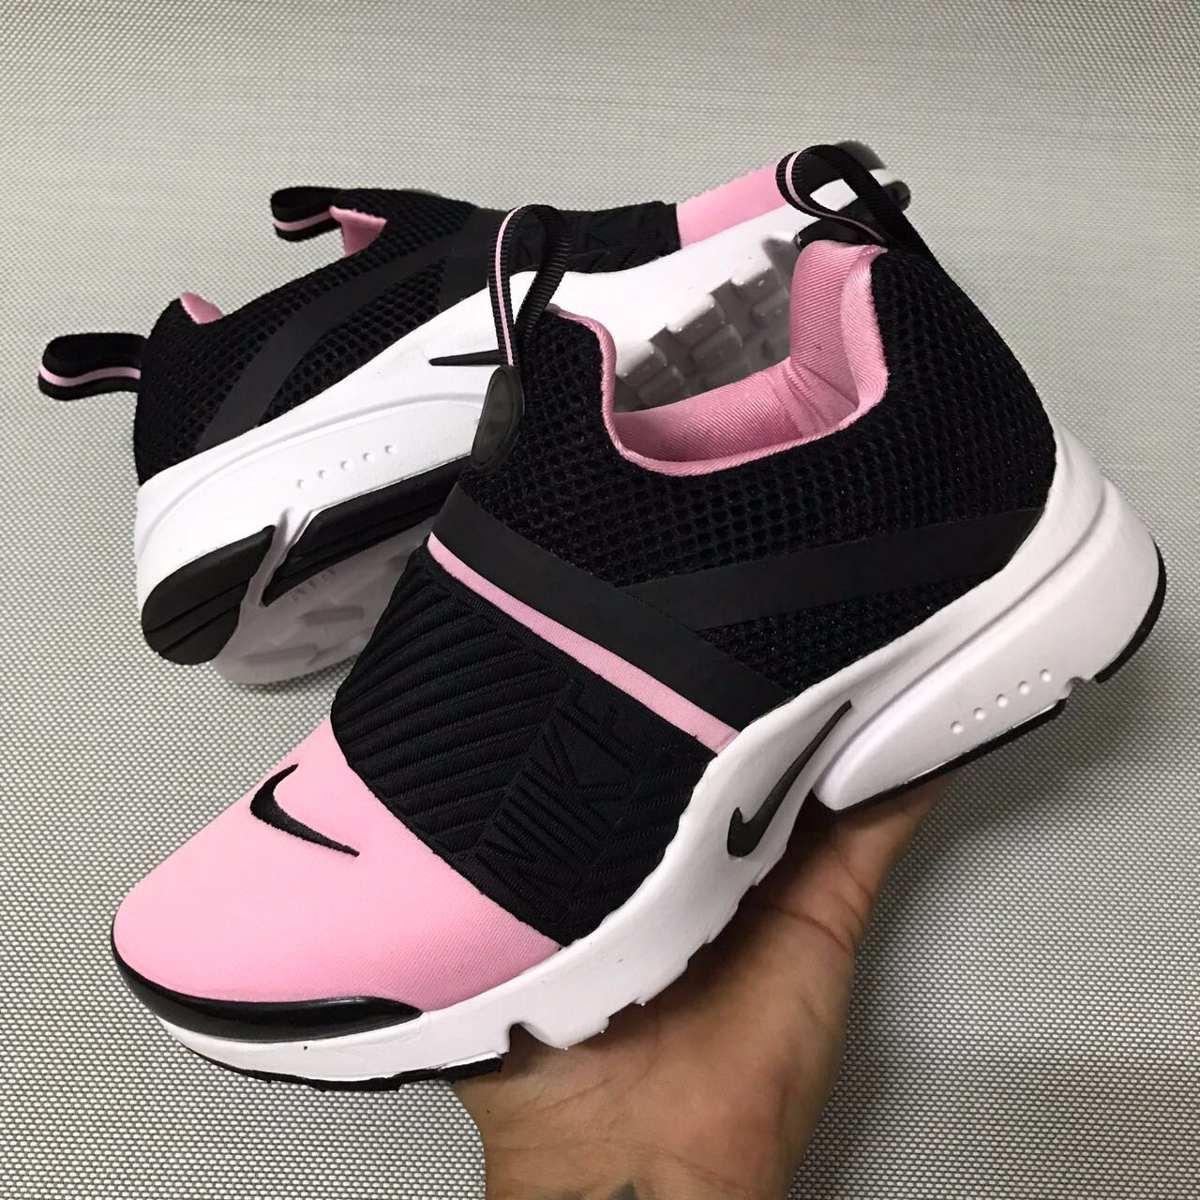 Tenis Zapatillas Nike Mujer Ultima Coleccion